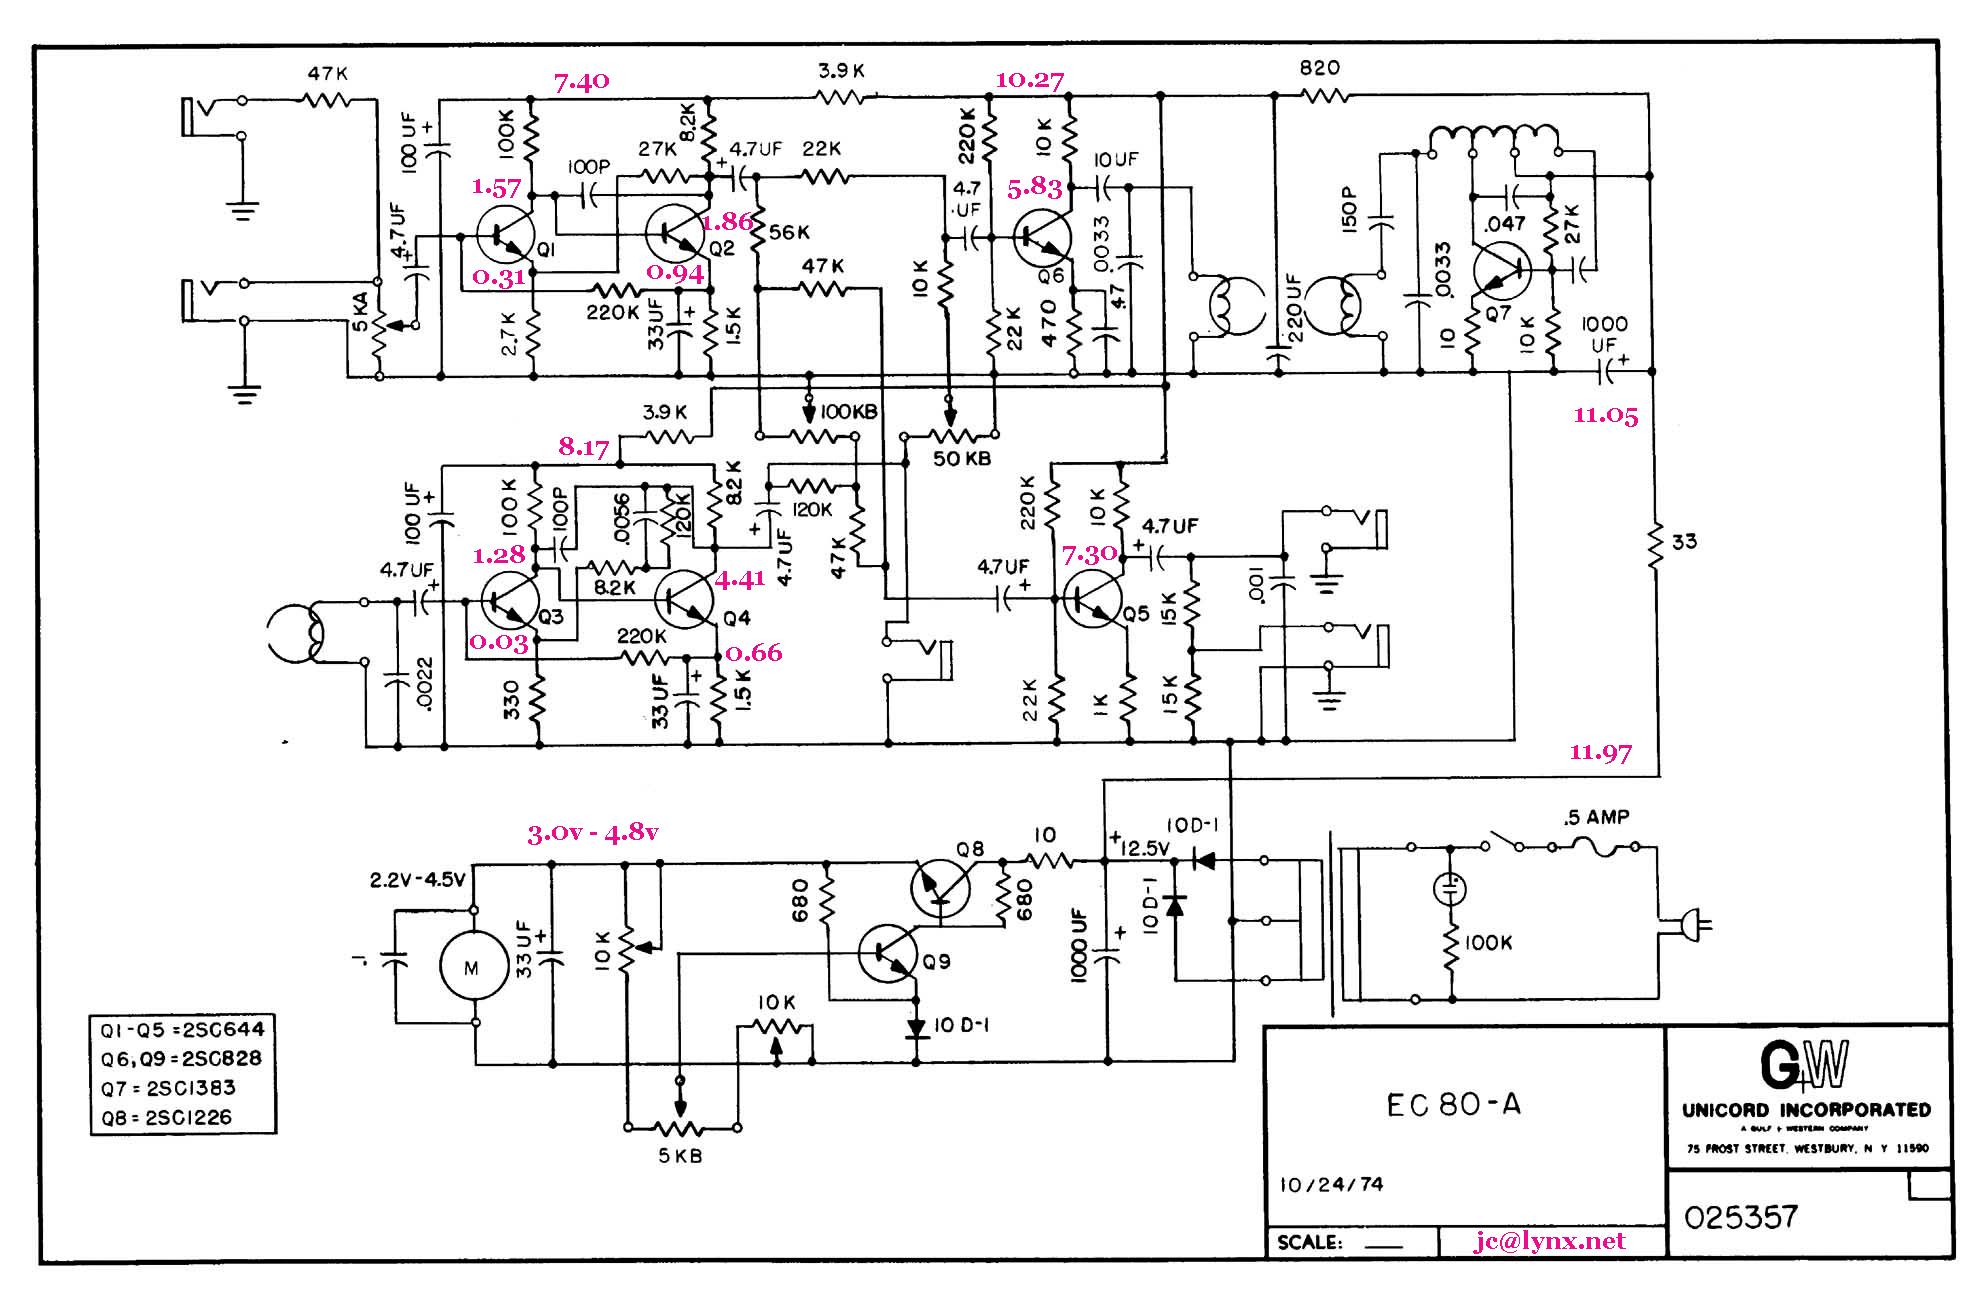 [Image: Unicord-EC-80_A.-voltages.jpg]